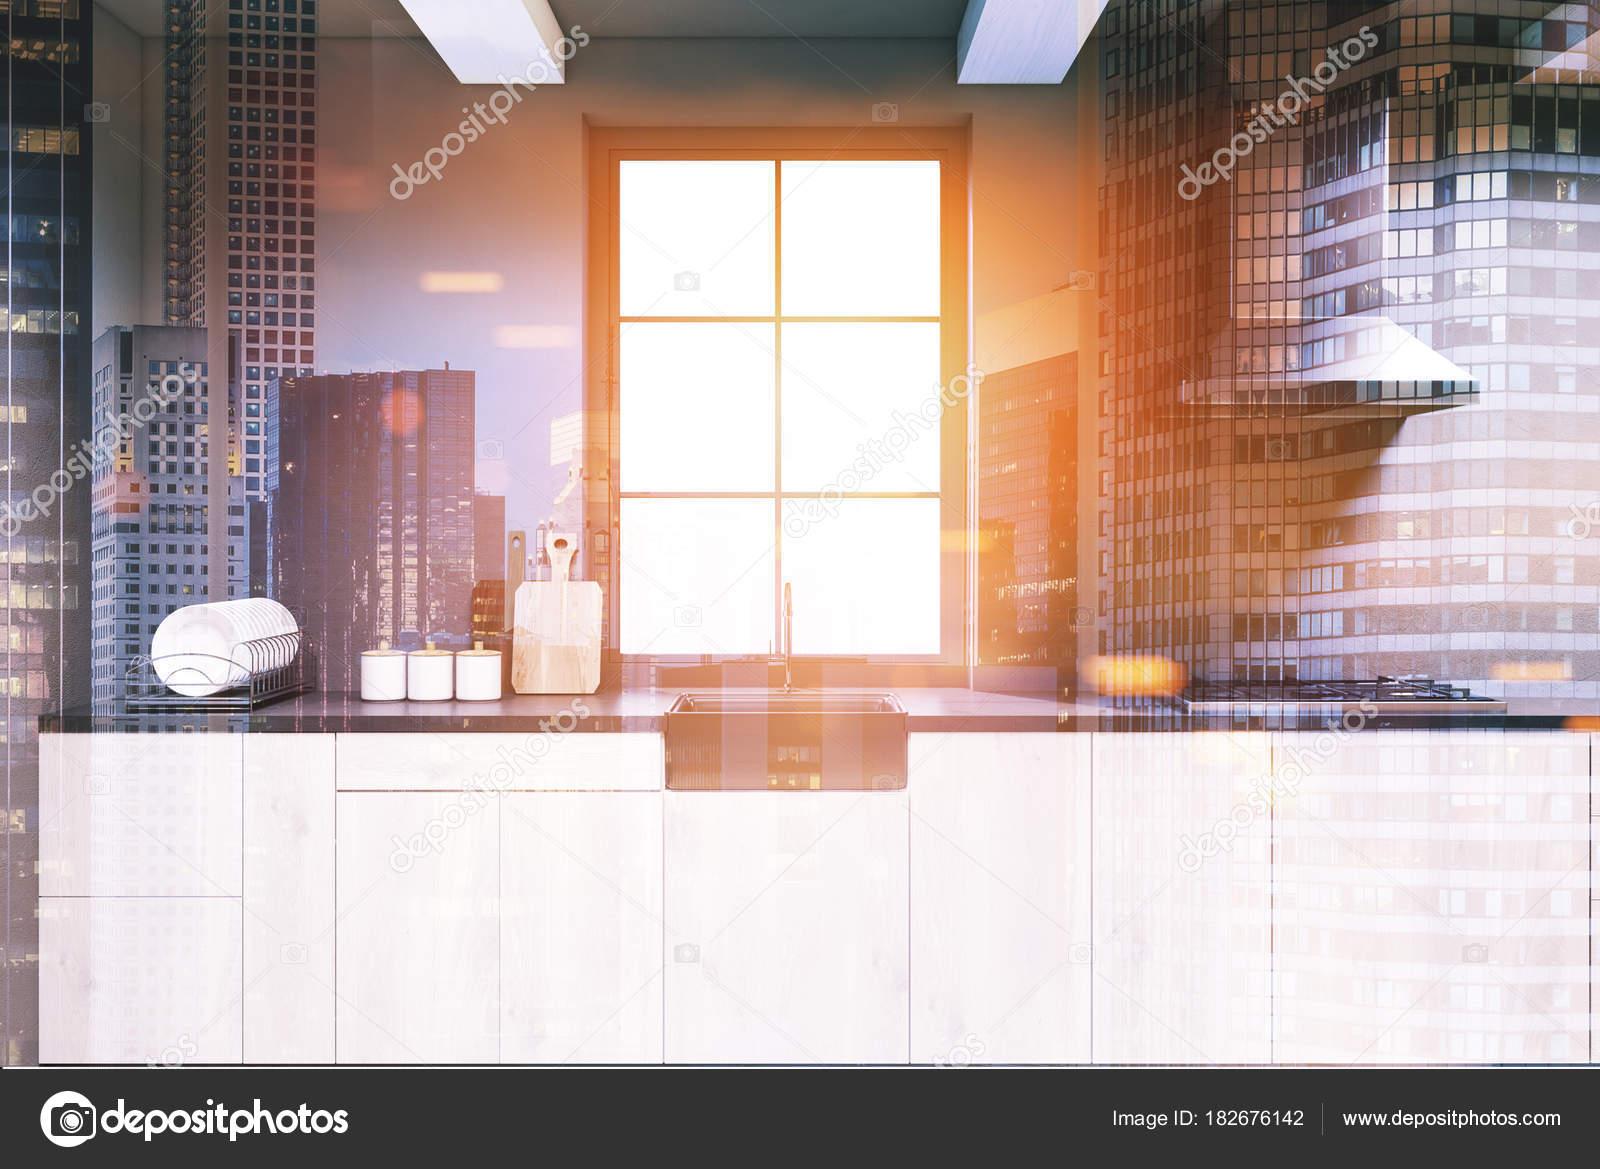 Dunkel grau Küche, aus Holz Arbeitsplatten getönt — Stockfoto ...